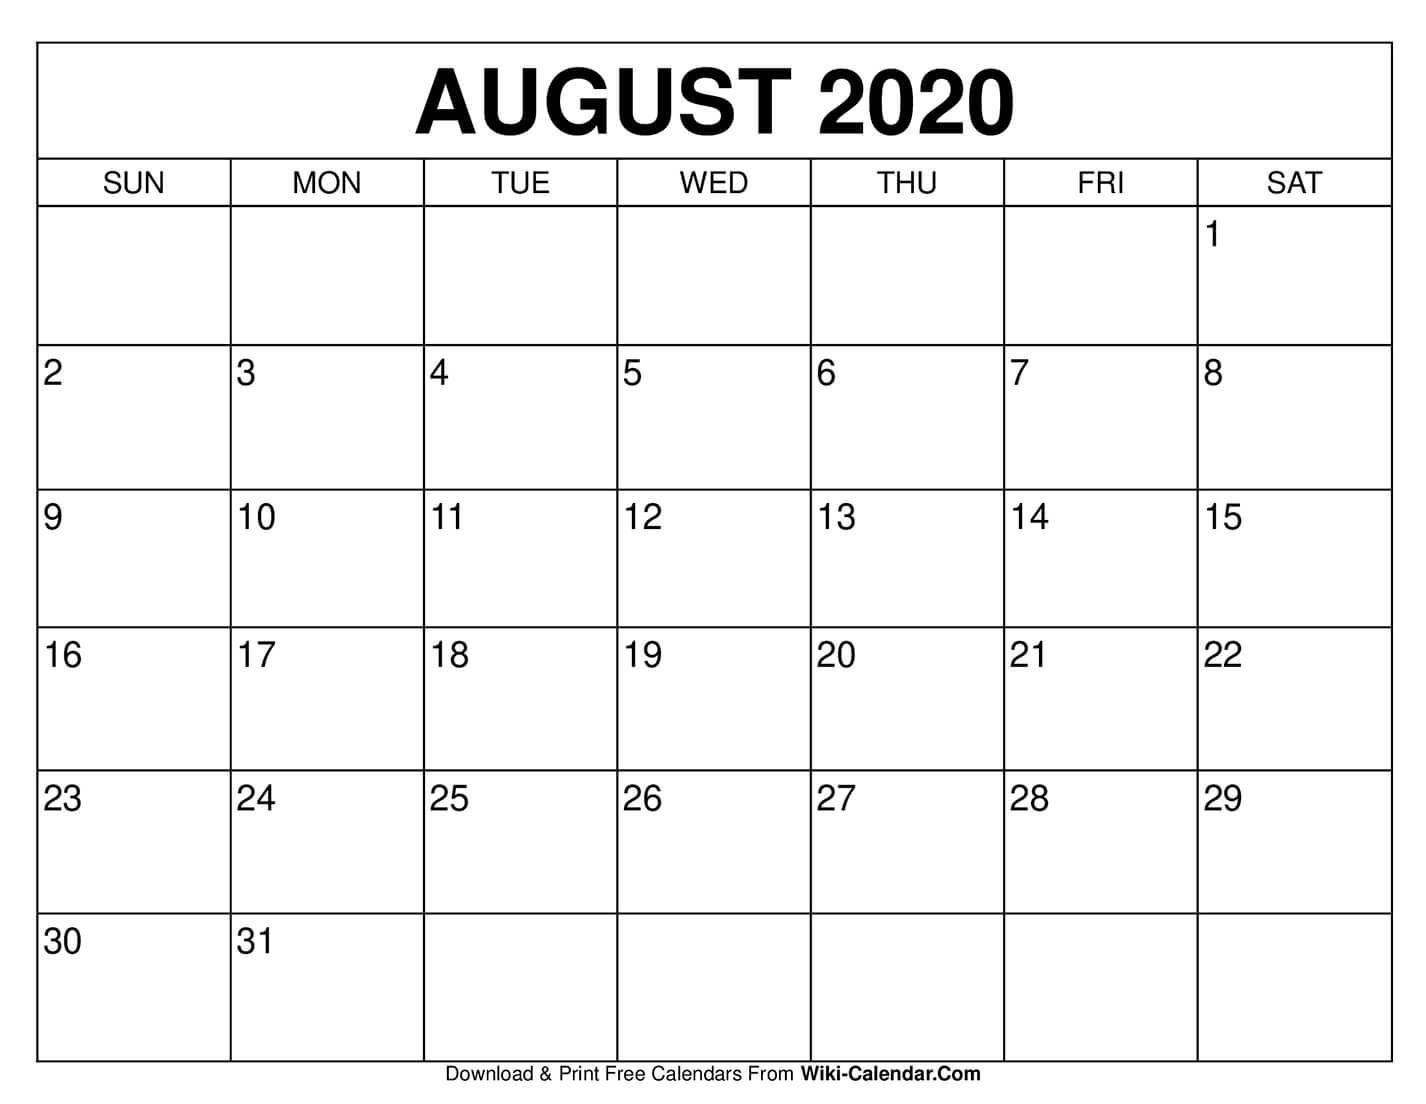 Free Printable August 2020 Calendars  Blank Calendar For August 2020 Printable